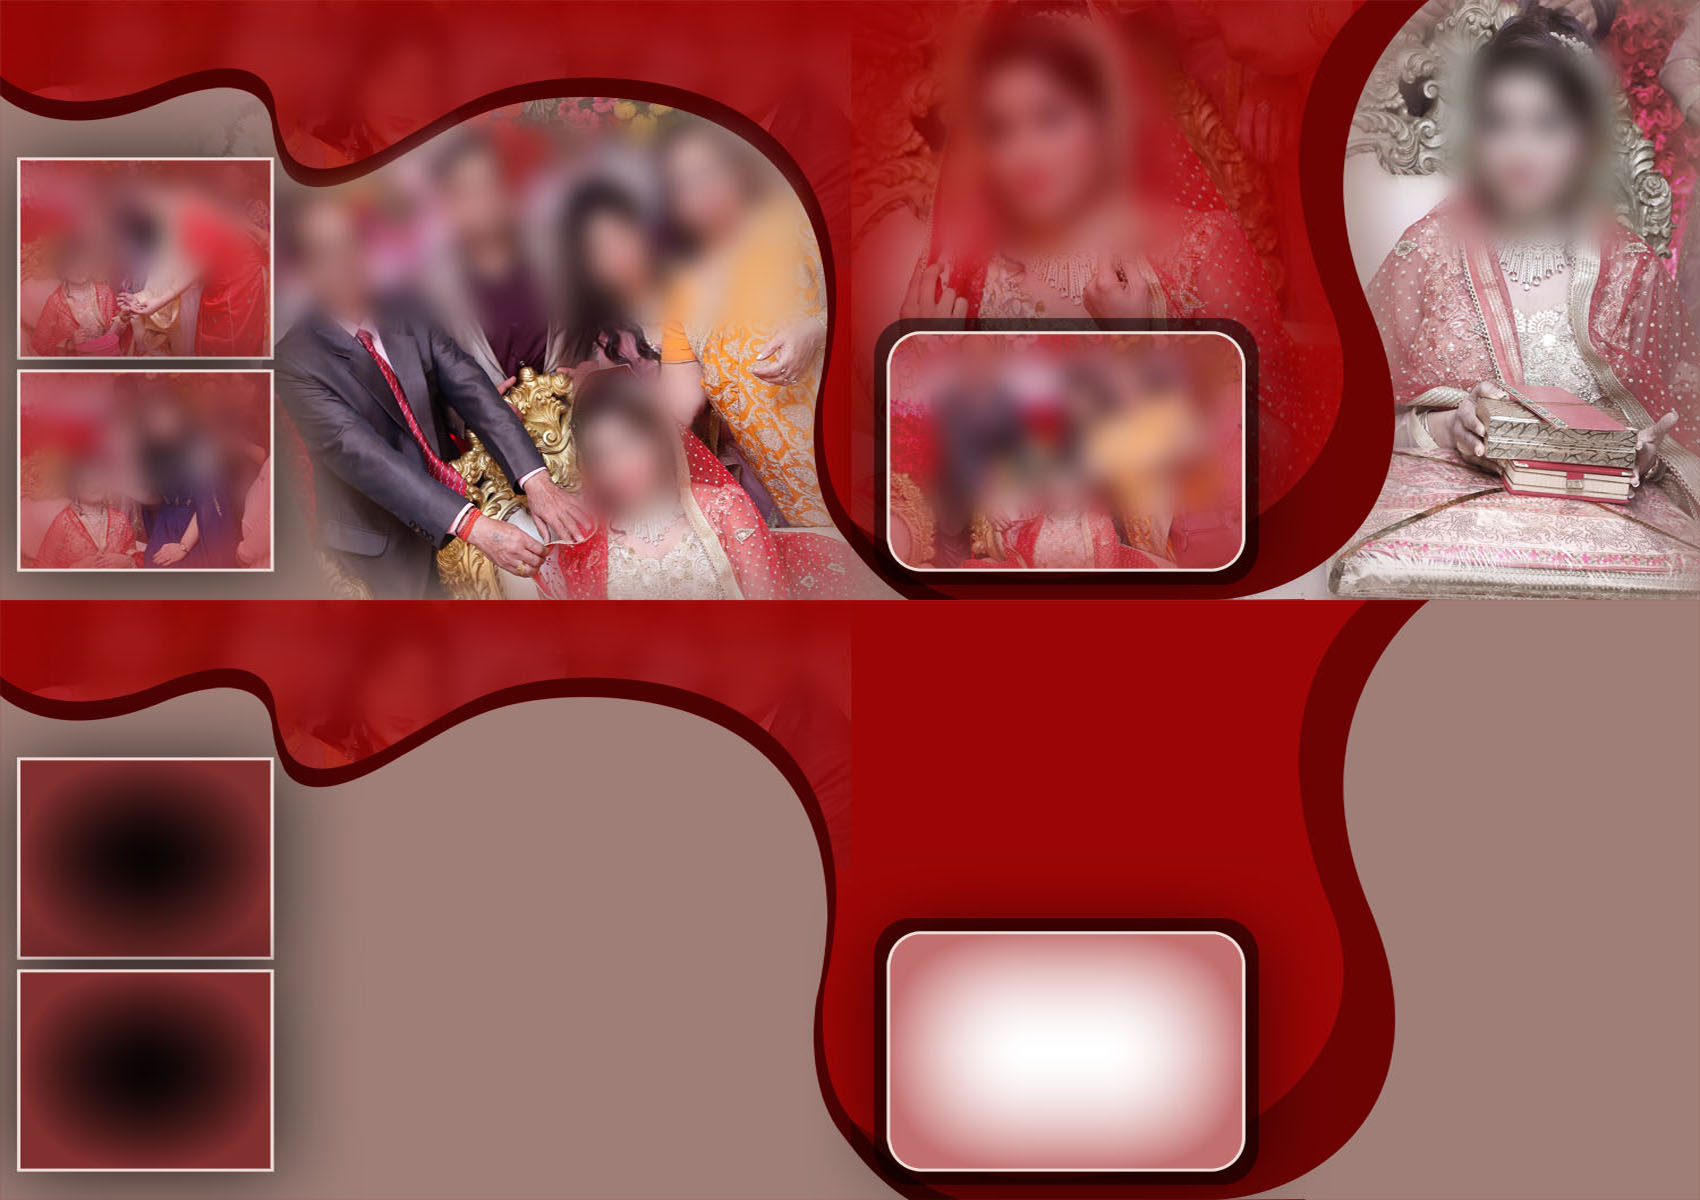 Wedding Album Background Images Free Download 50015 Lavanya Fabric Design